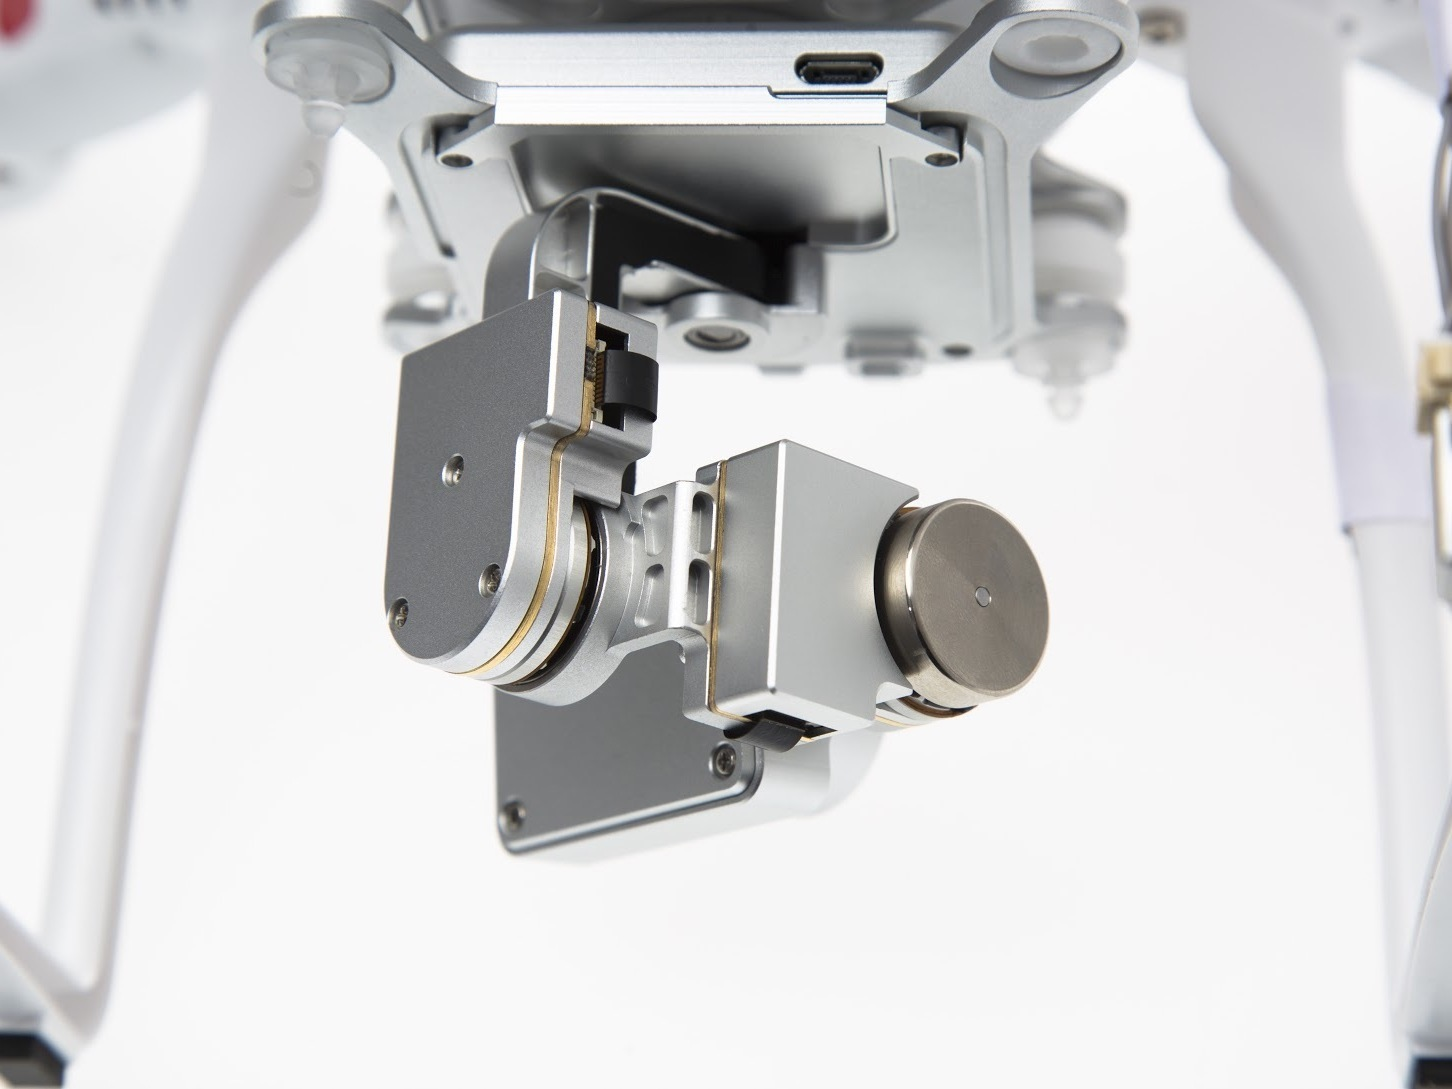 HmmcsAQ5ZPPyrWKE dji phantom 2 vision repair ifixit phantom 2 vision plus camera wiring diagram at eliteediting.co